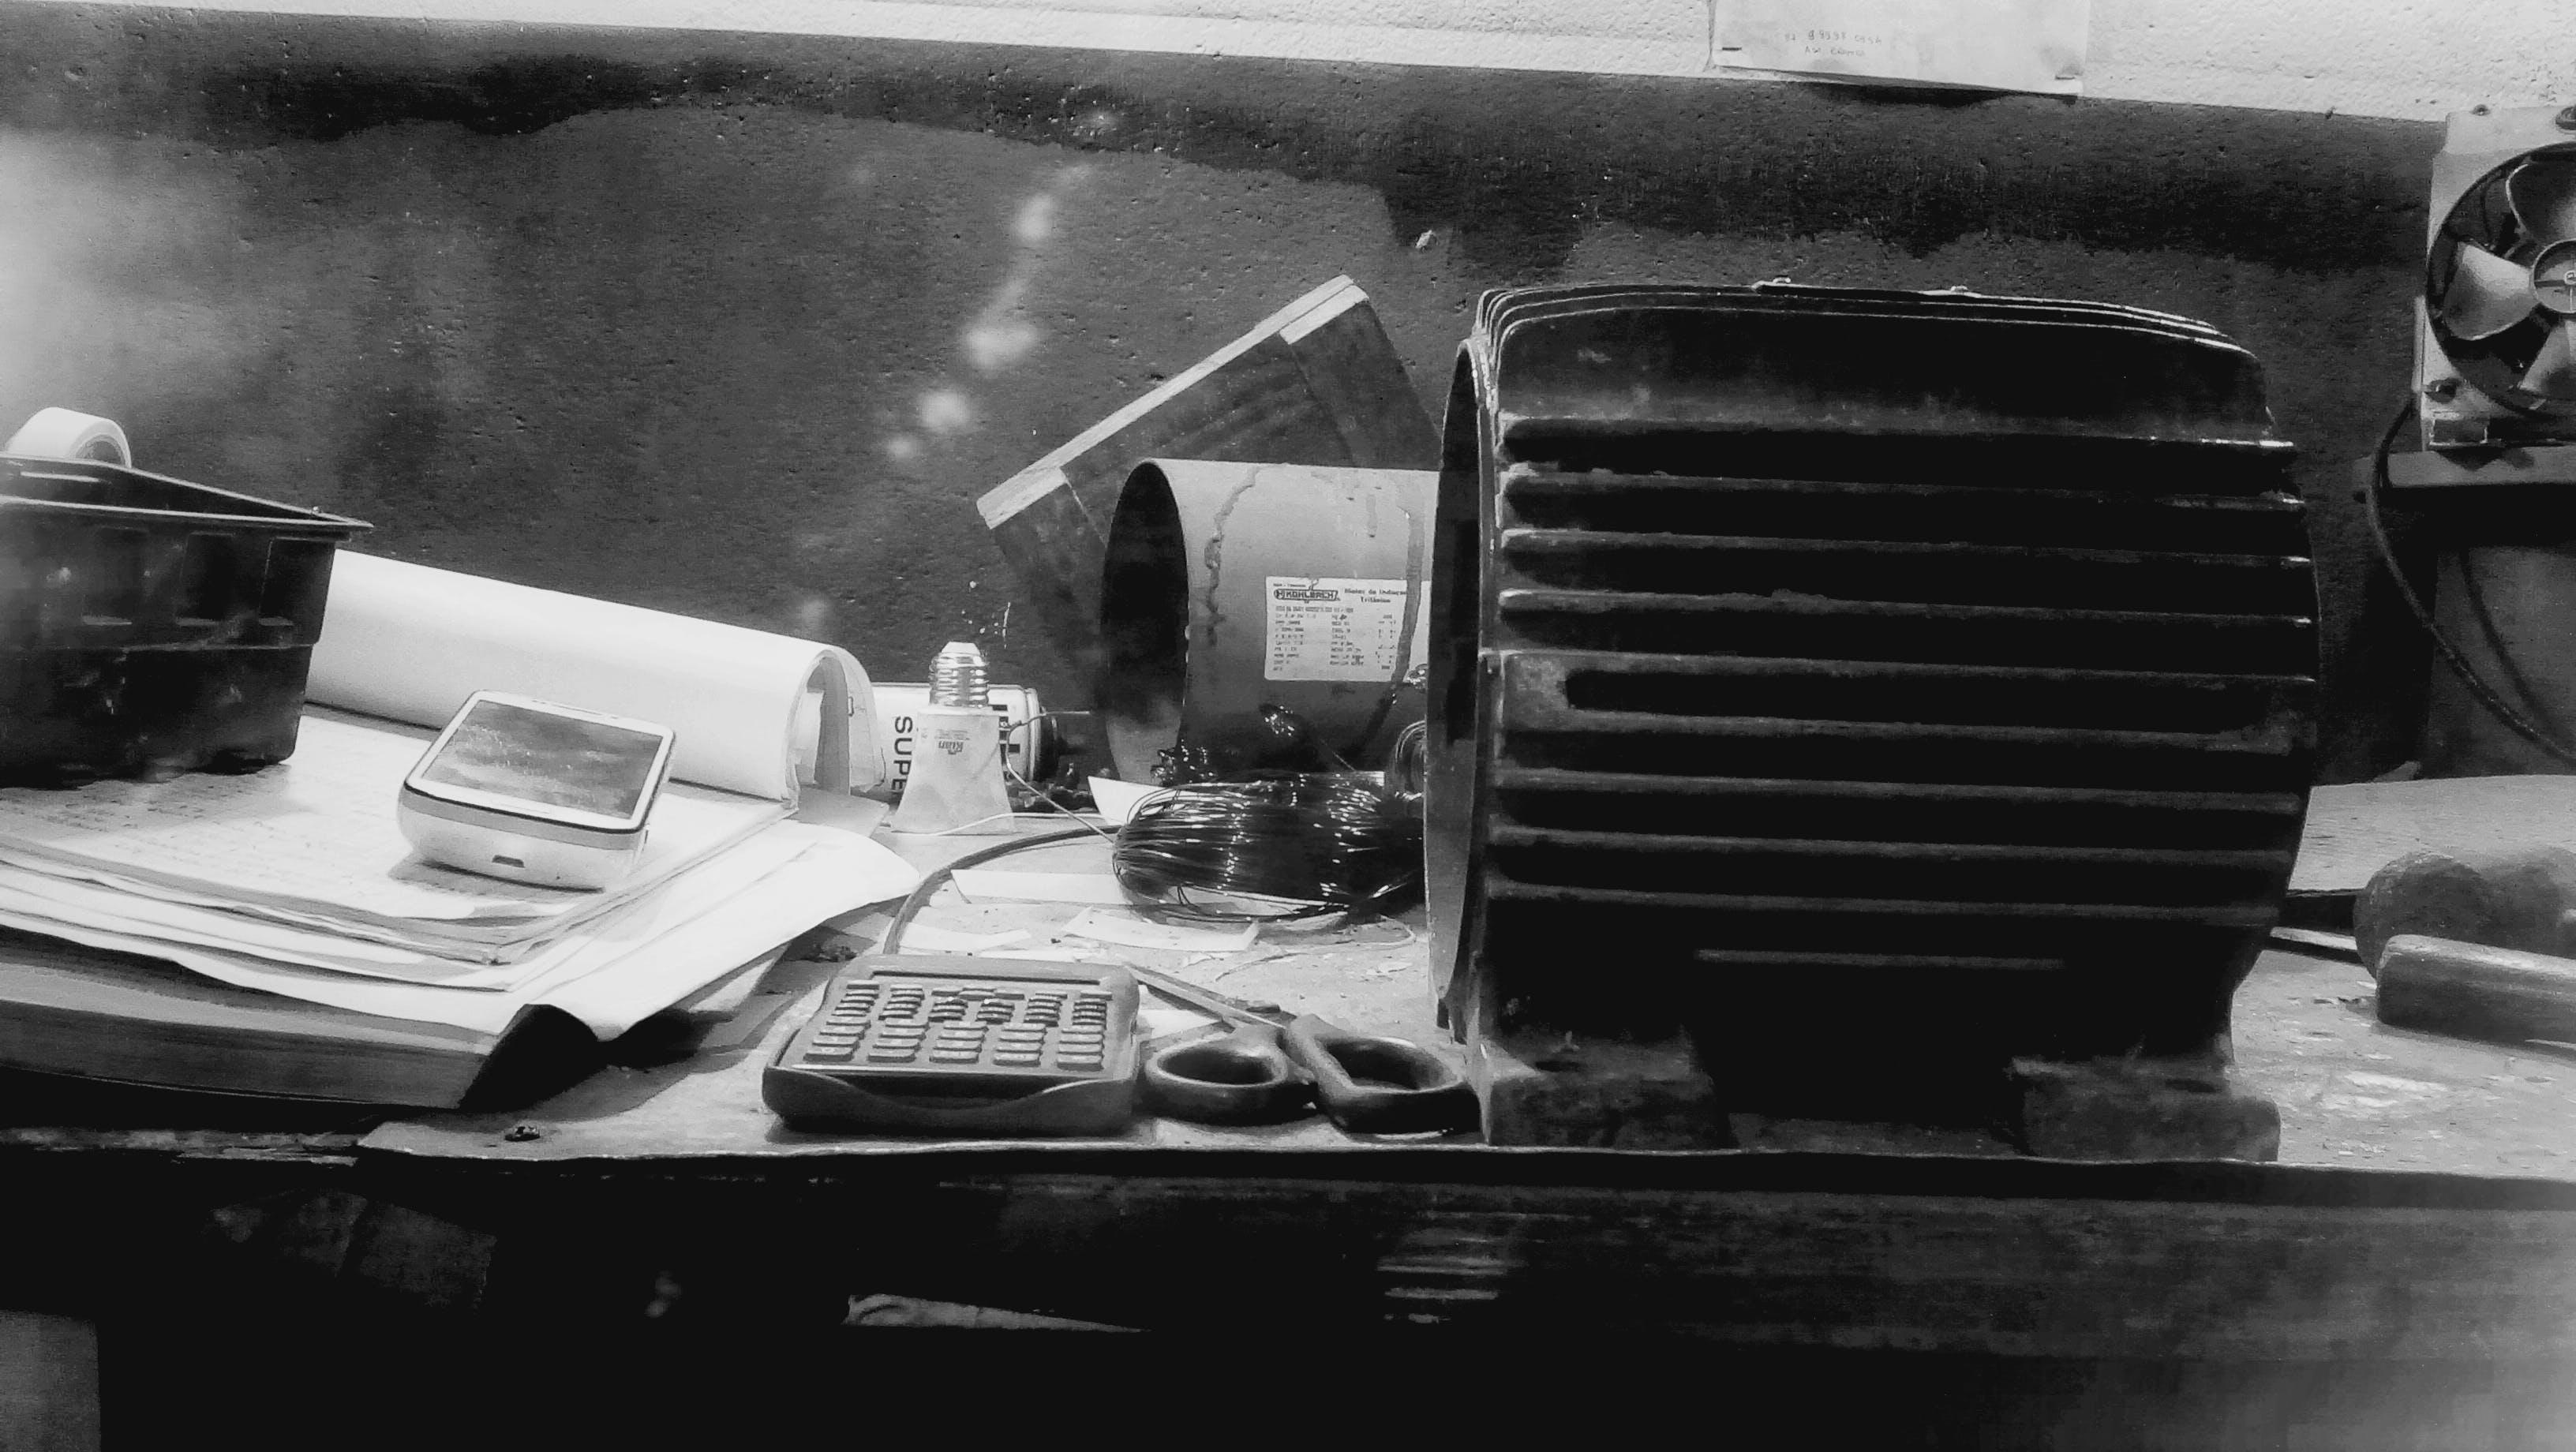 Free stock photo of hard work, work area, work desk, workbench